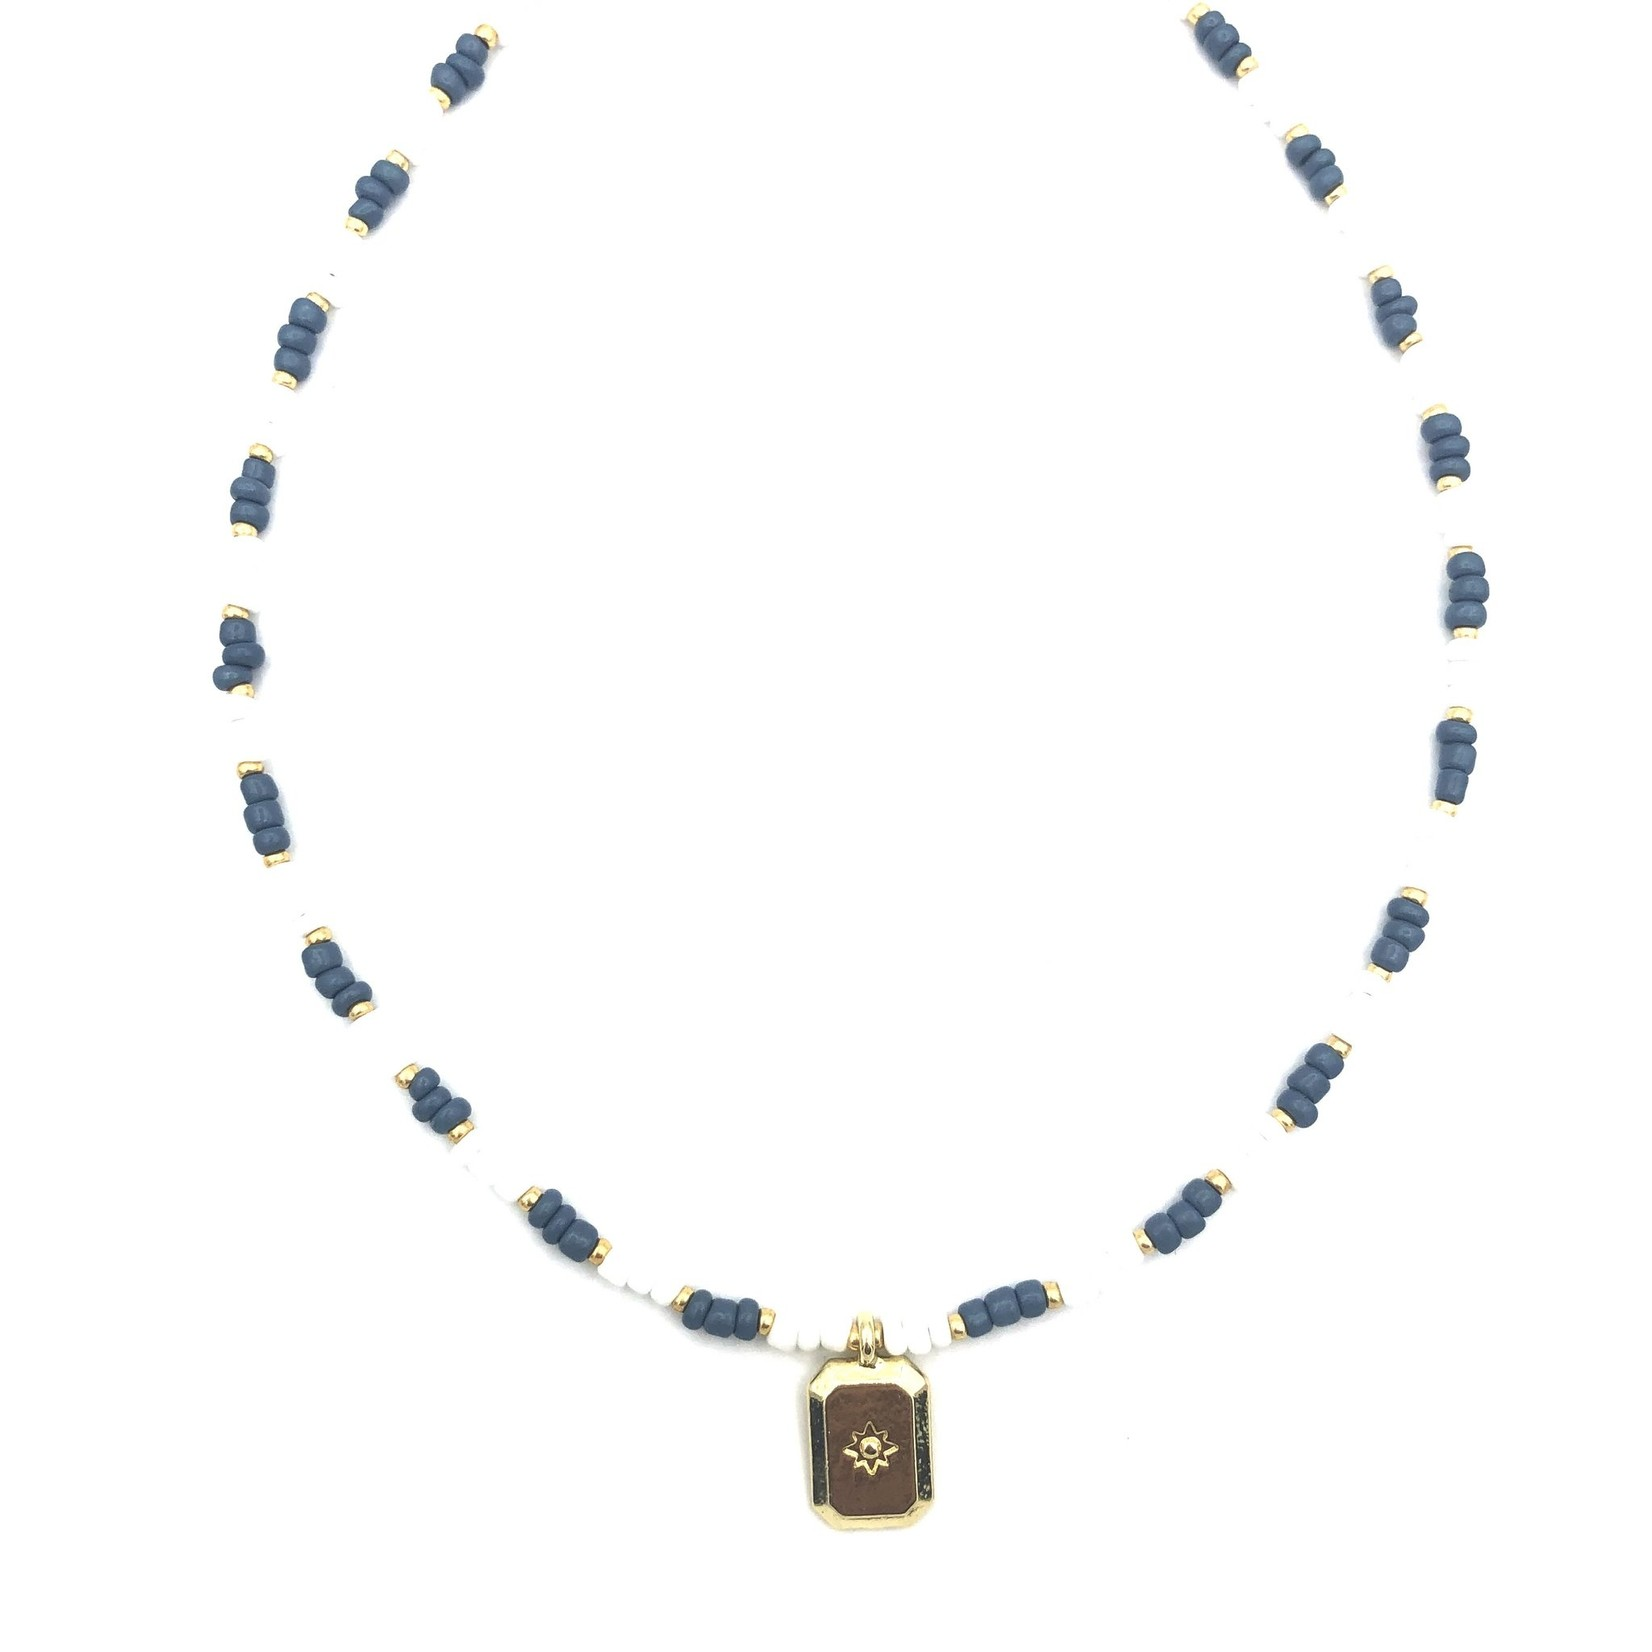 Boho-Beach Ketting wit/blauw met goudkleurige hanger